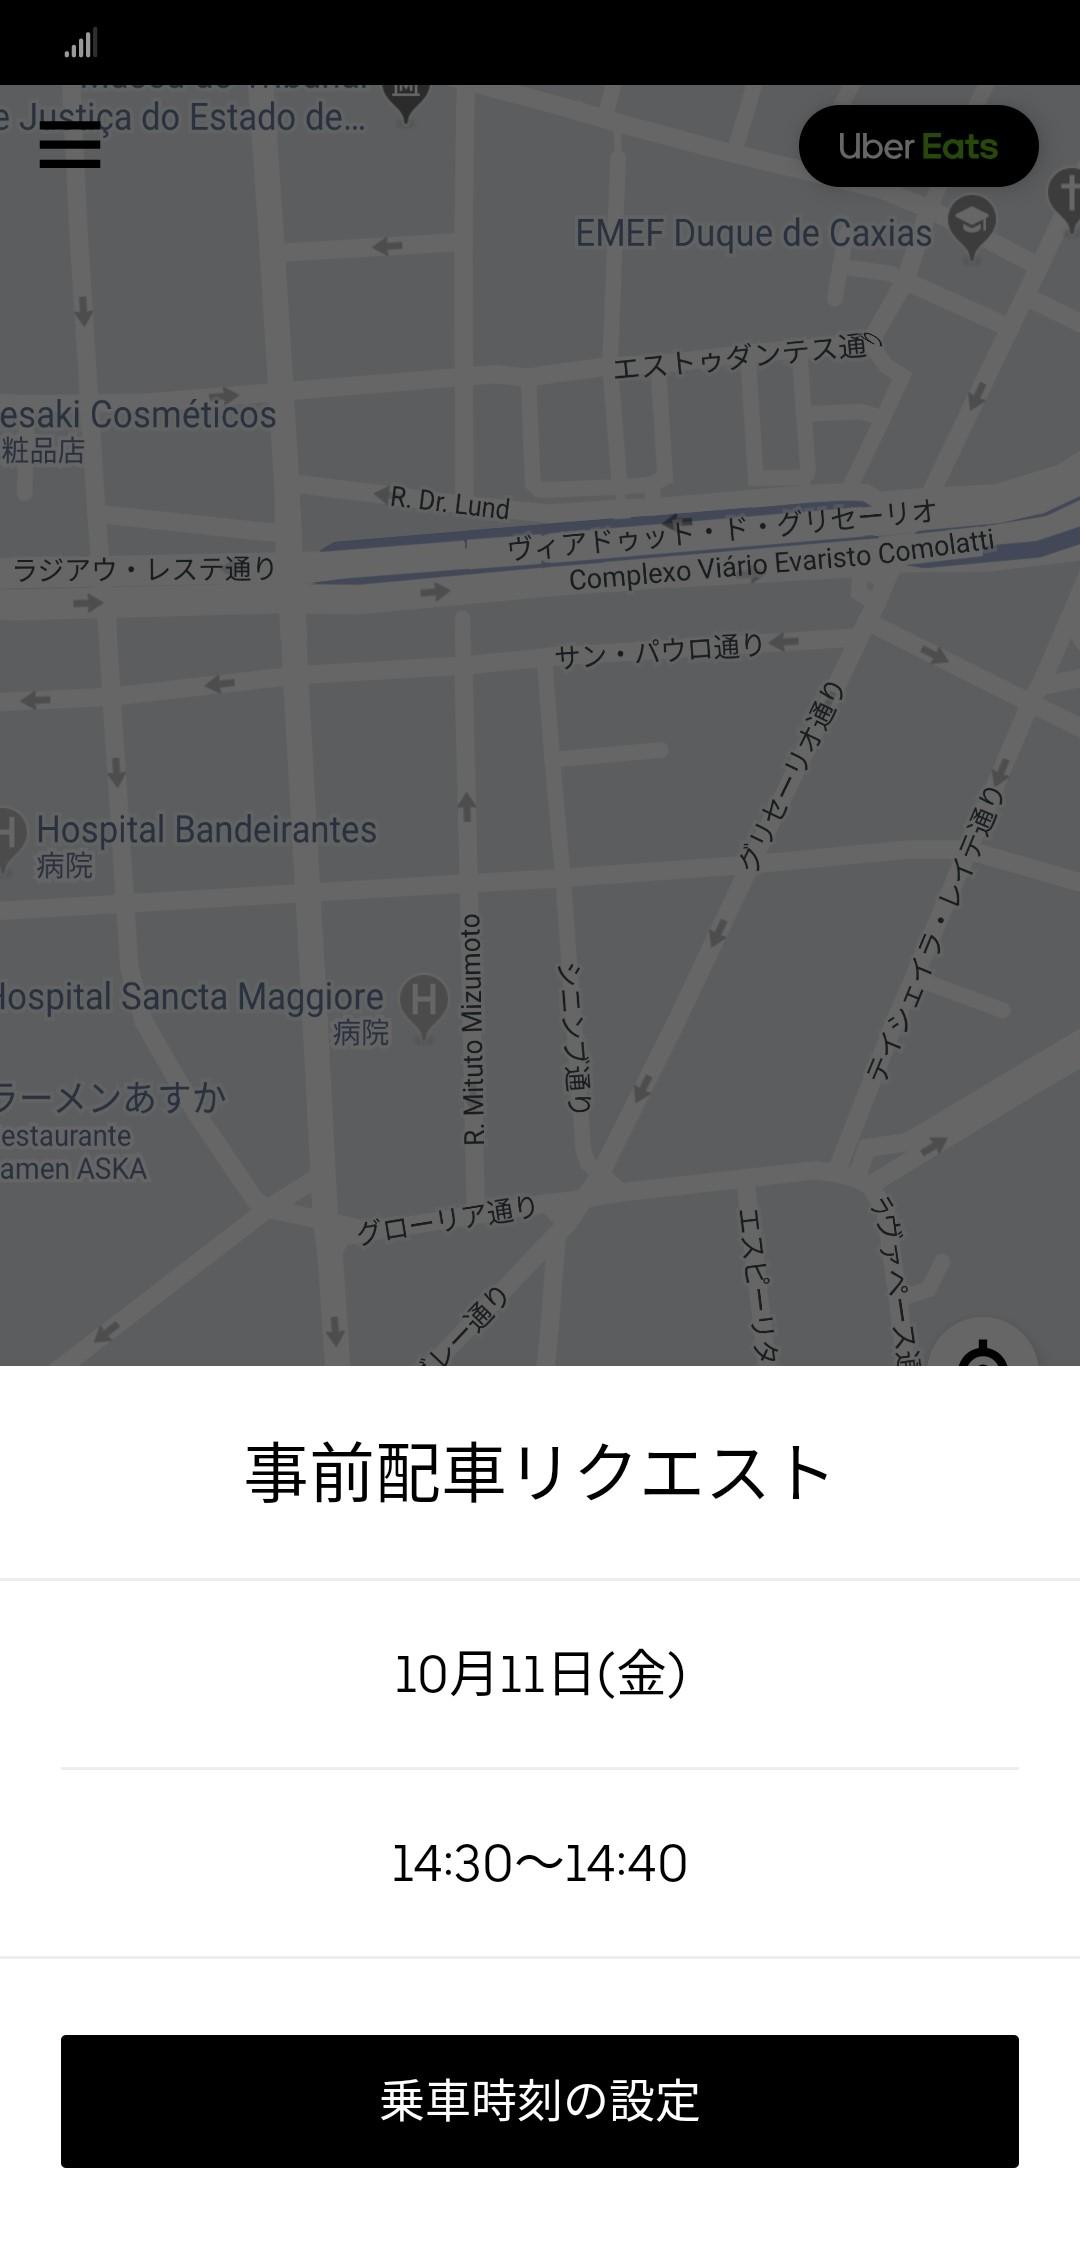 Uber日時指定画面